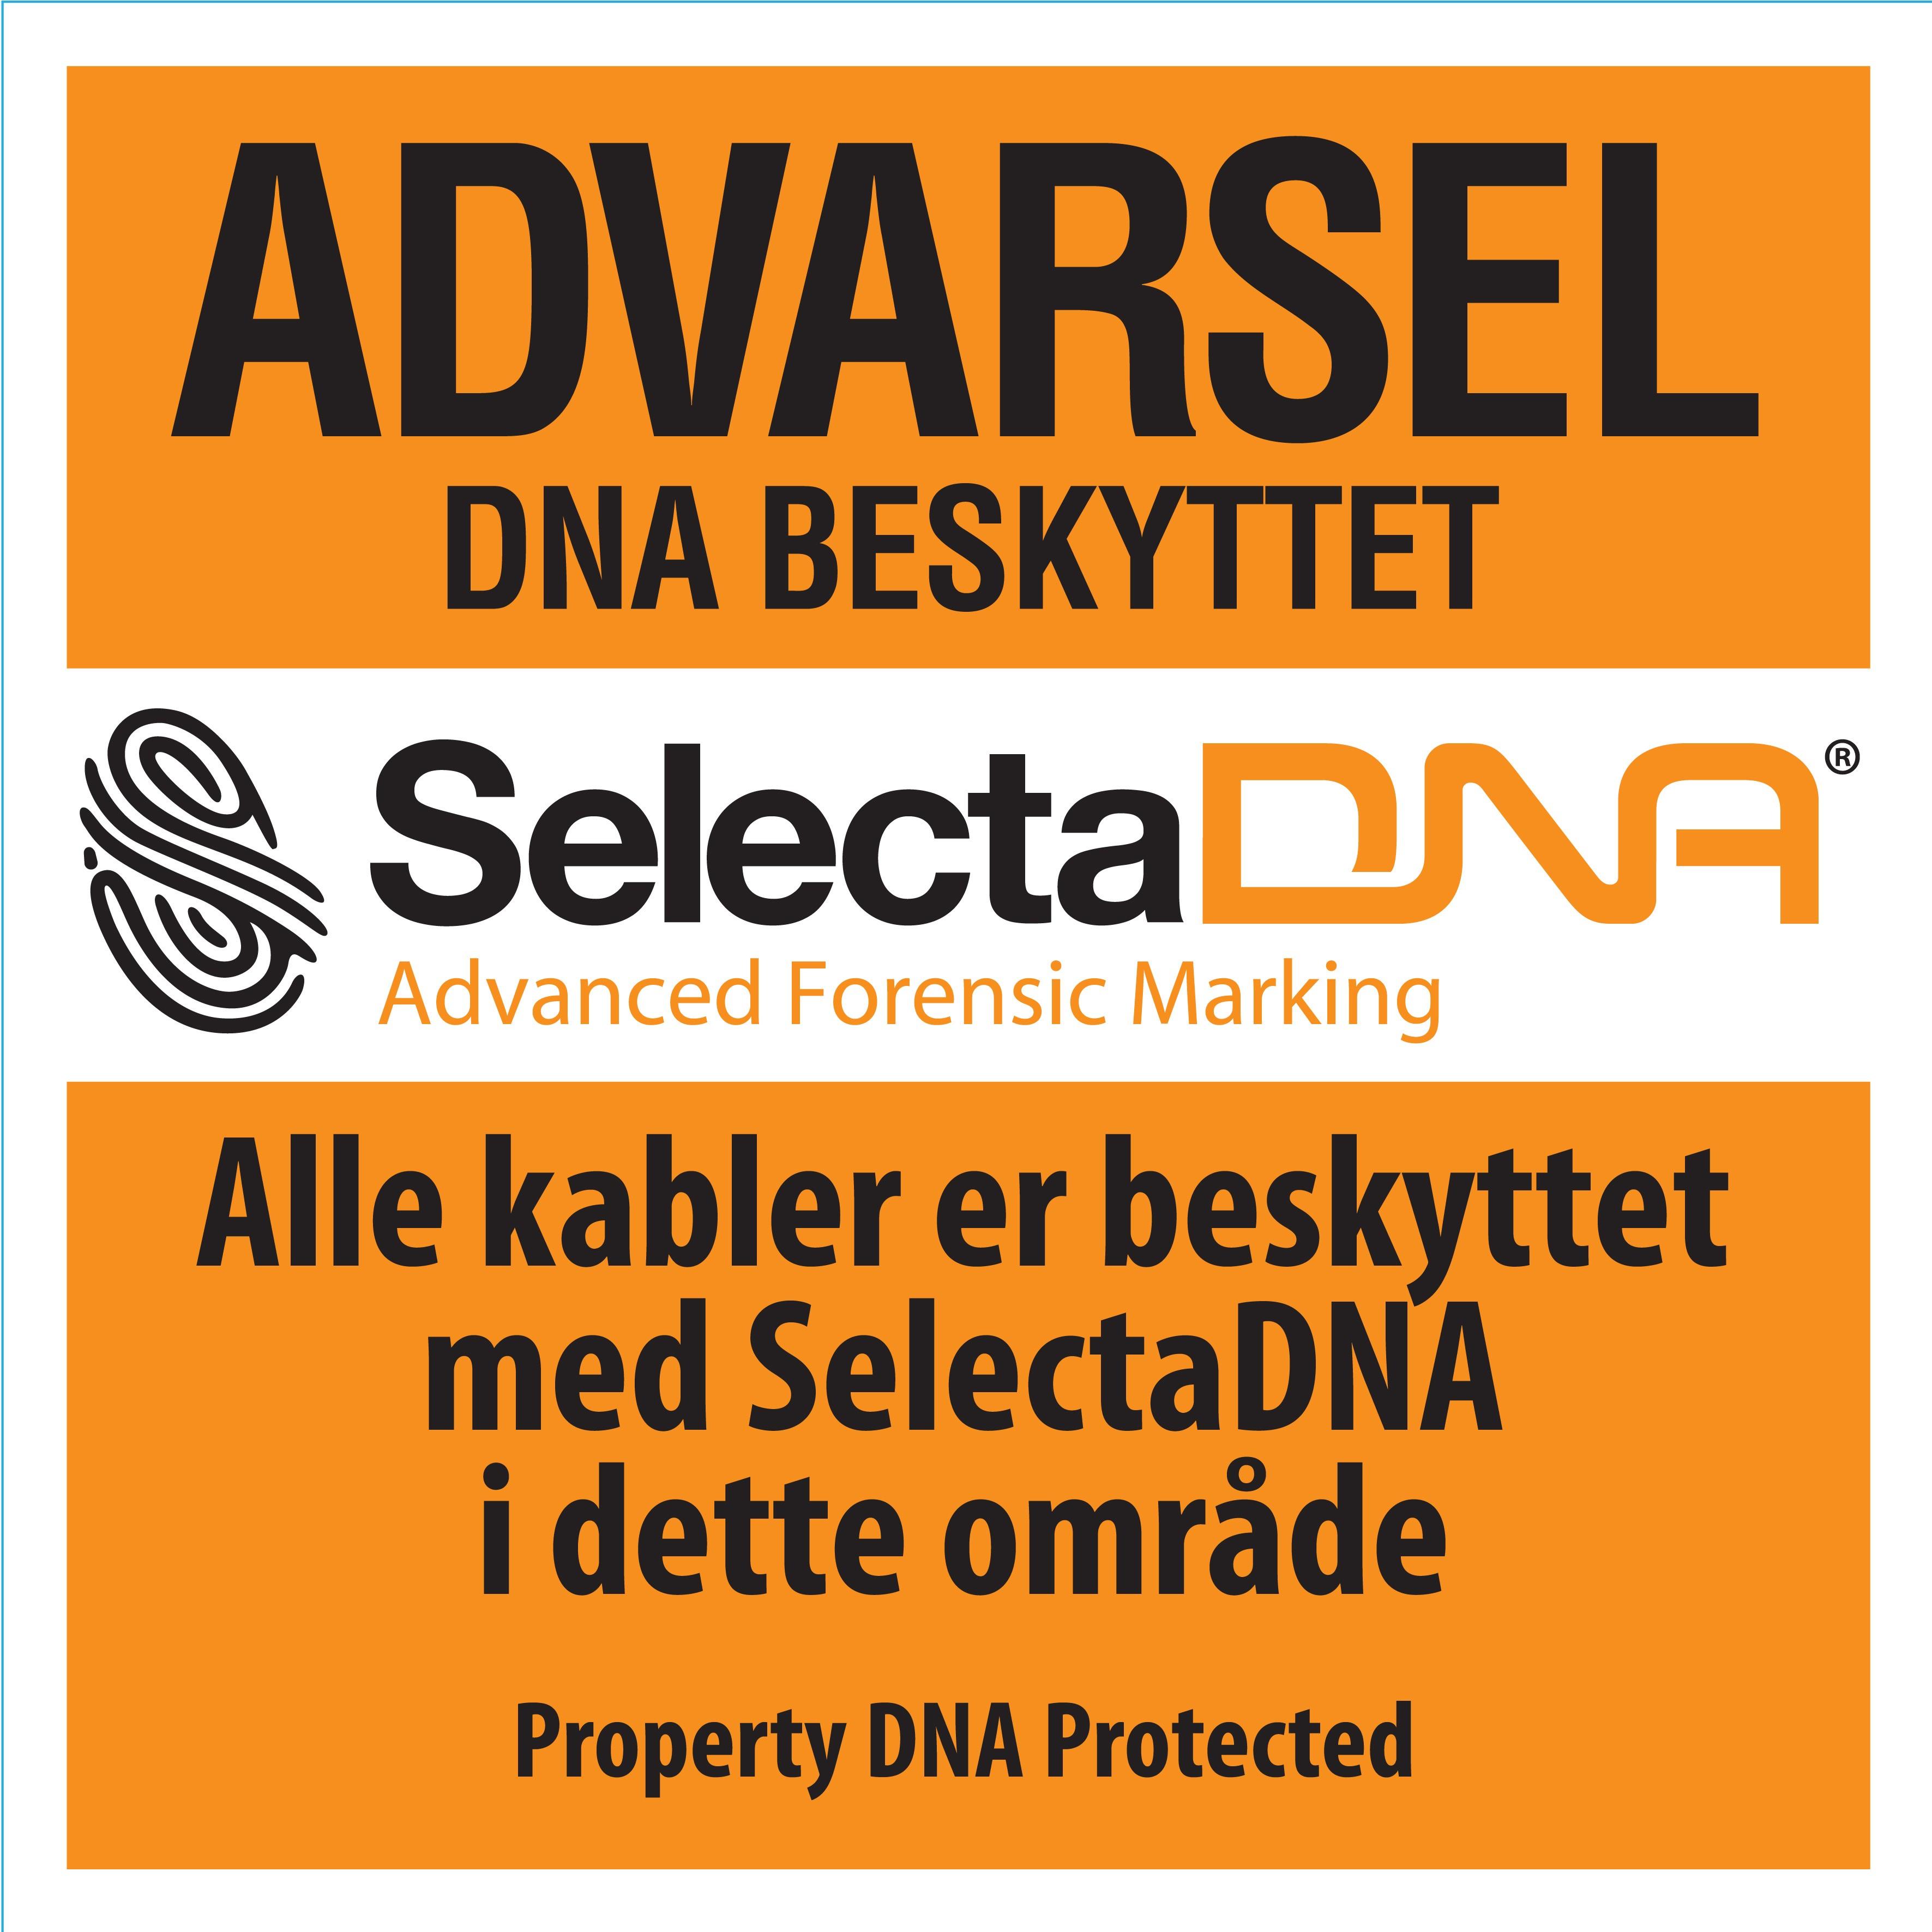 SelectaDNA Metal Advarsels Skilt (30x30cm)